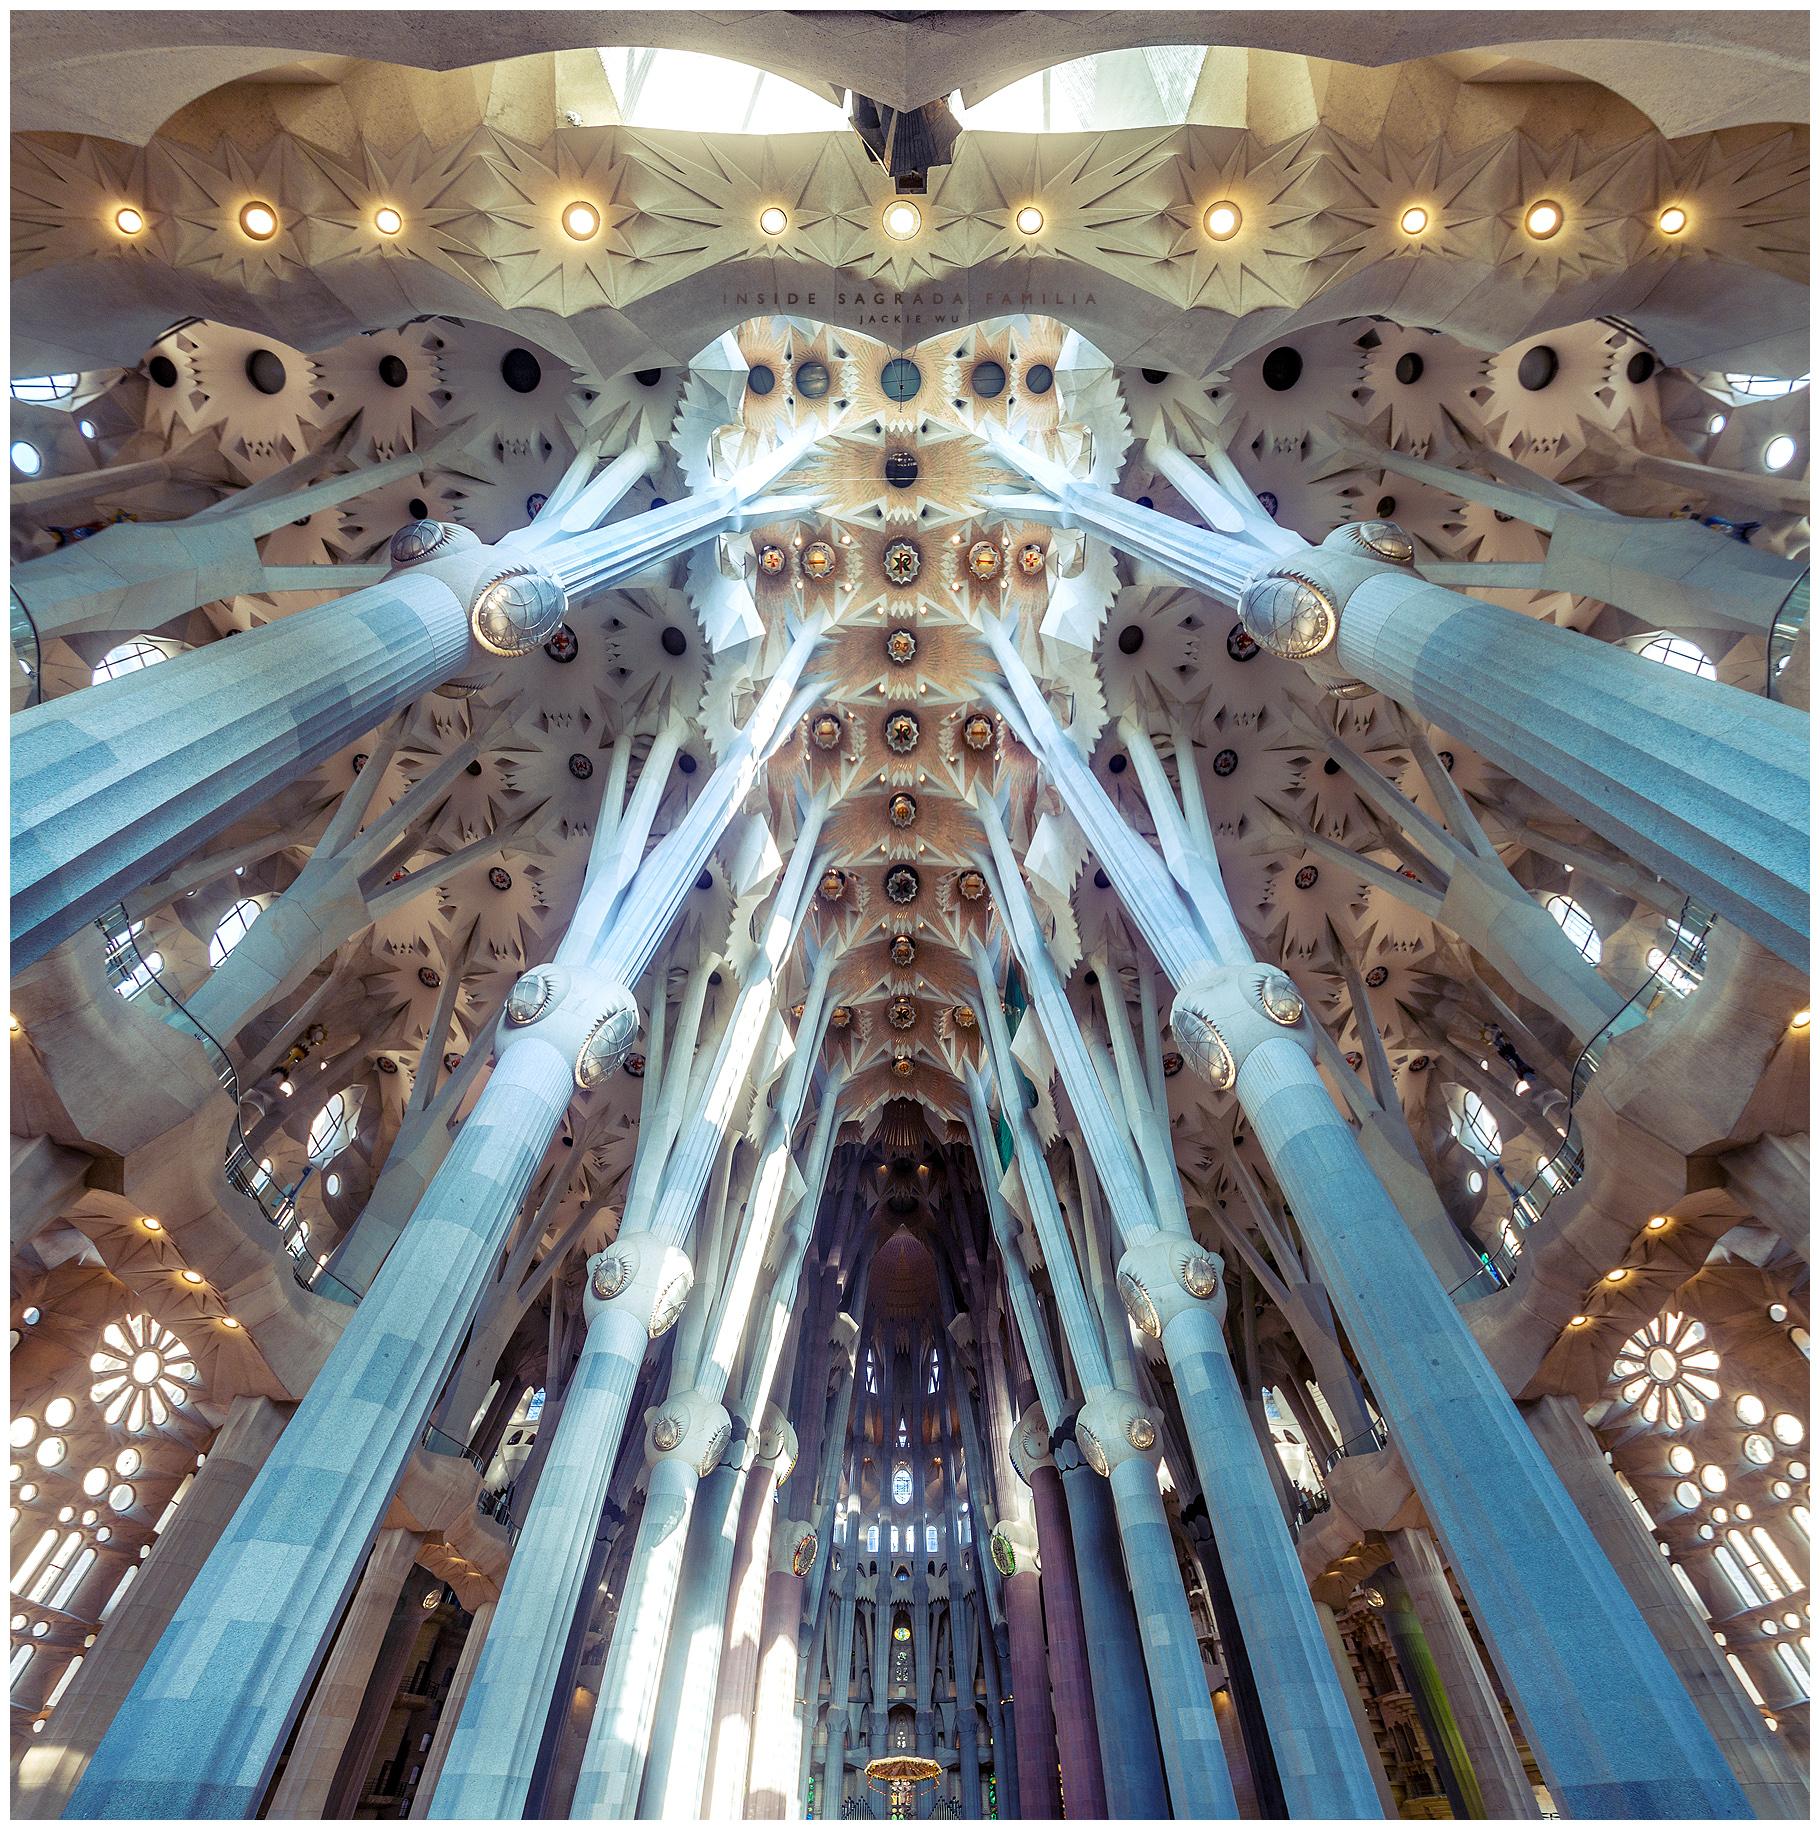 Inside Sagrada Familia by geckokid on DeviantArt